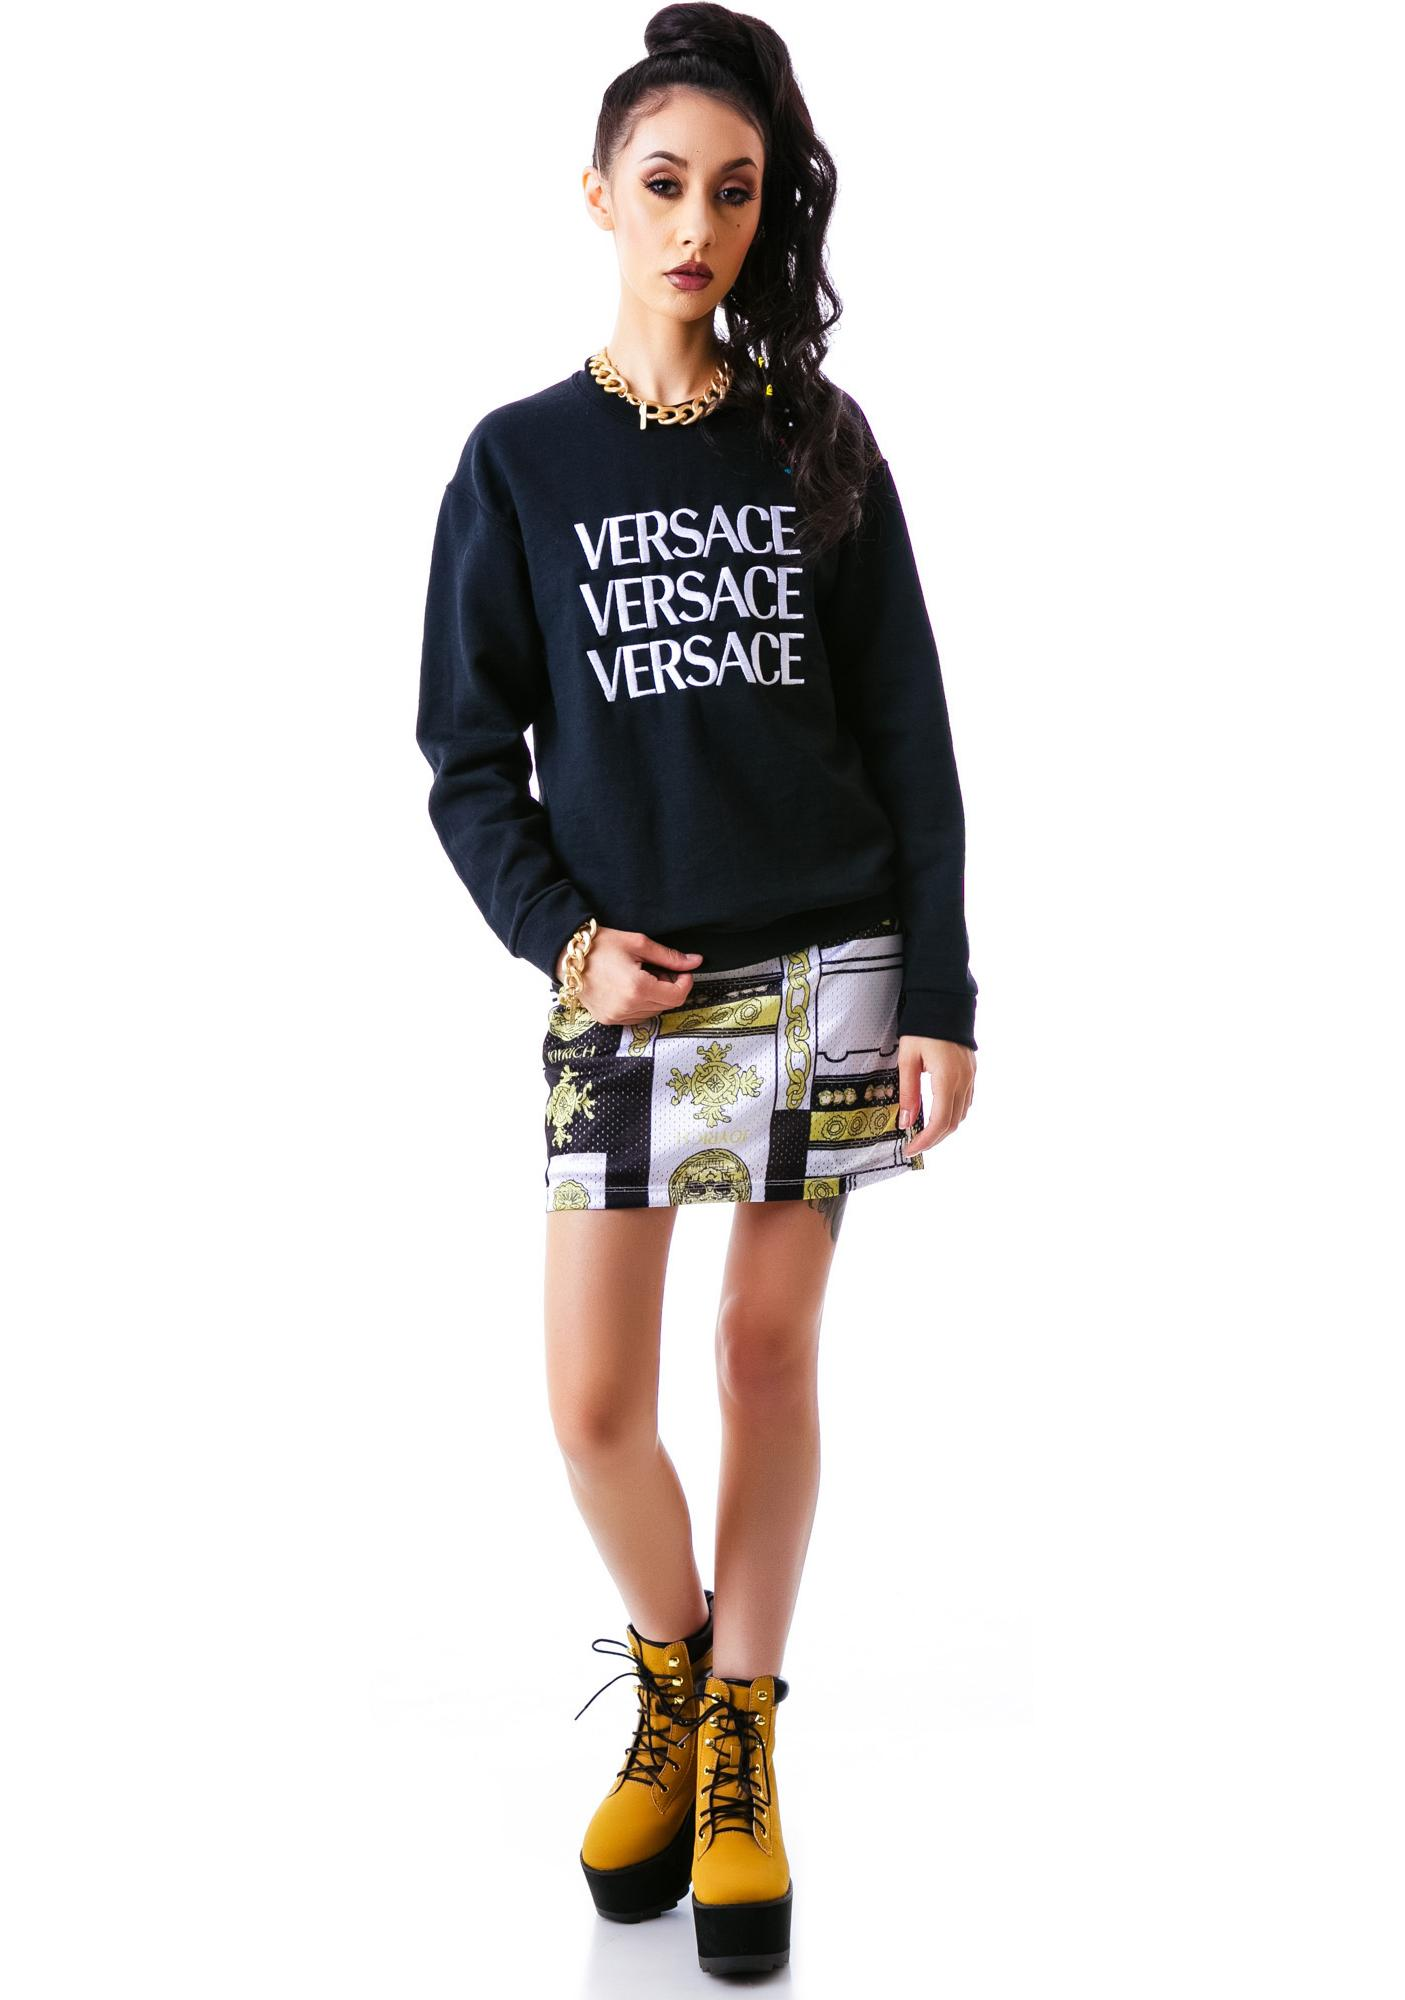 Private Party Versace Sweatshirt